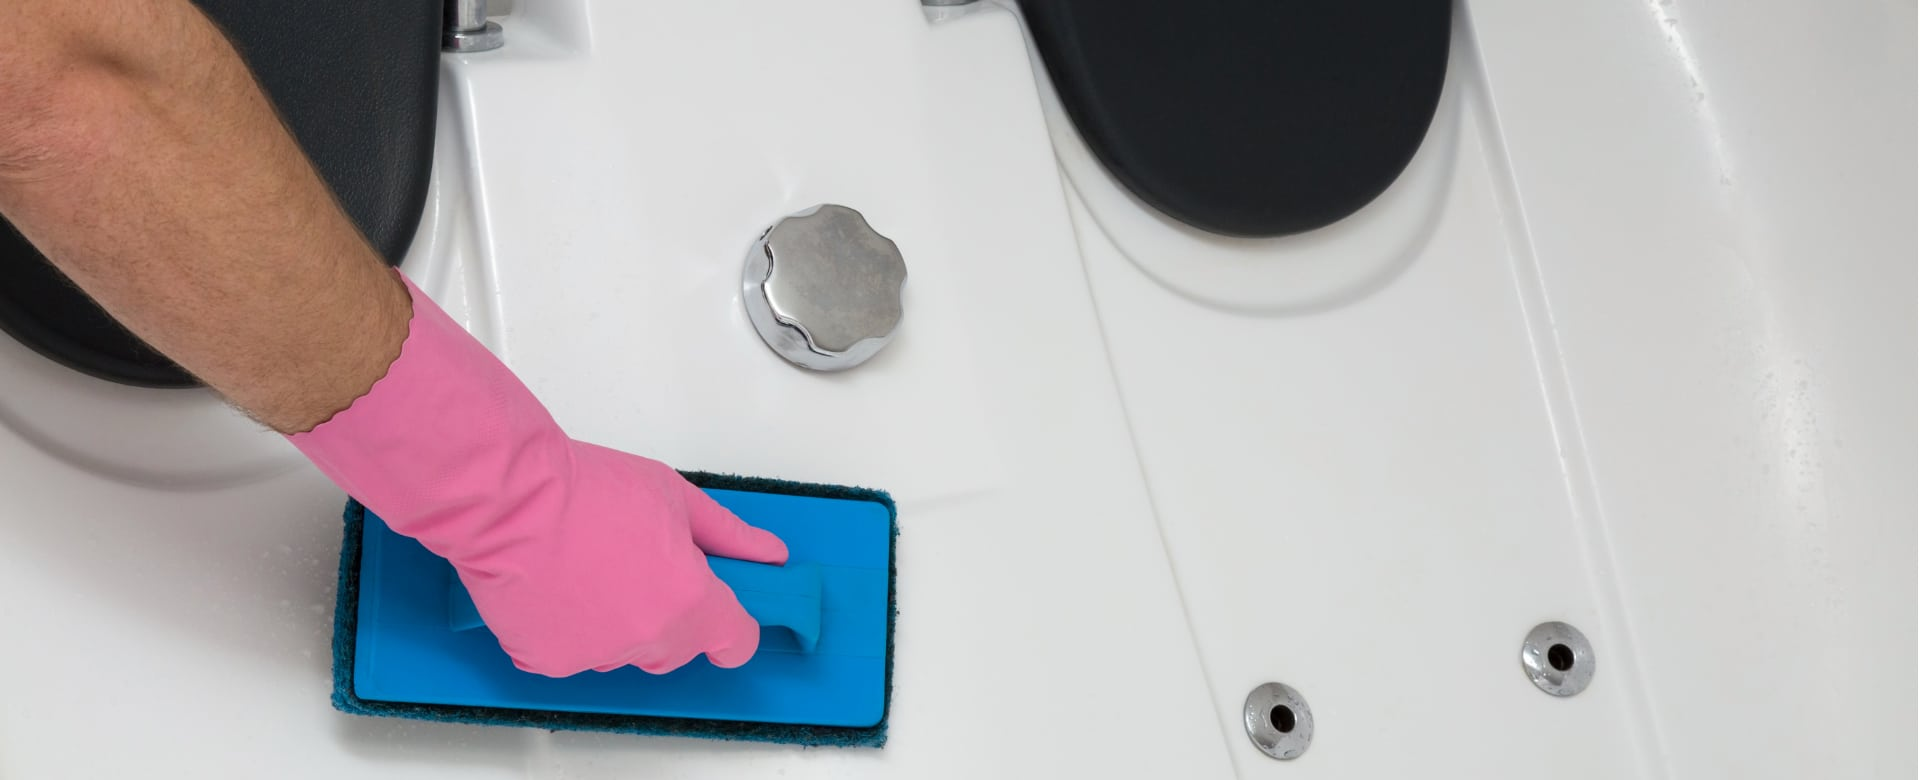 Nettoyer Filtre Spa Vinaigre Blanc entretien d'un spa, mode d'emploi - ibiza spa